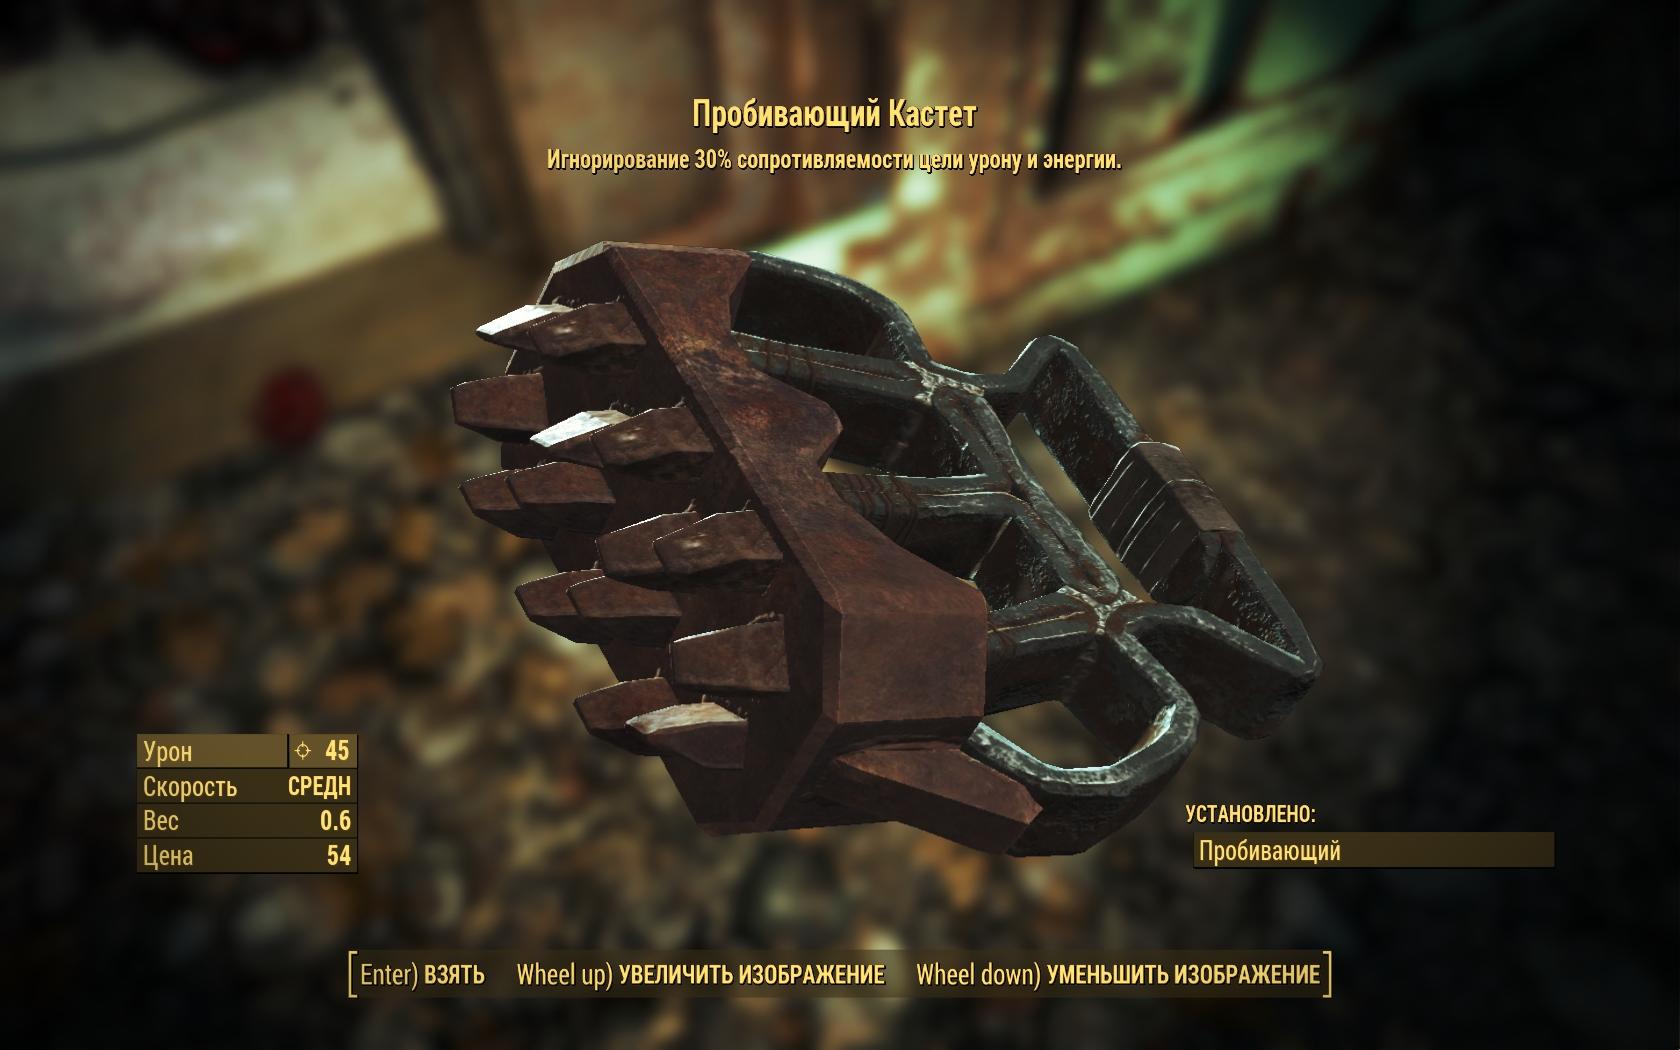 Пробивающий кастет - Fallout 4 Оружие, Пробивающий